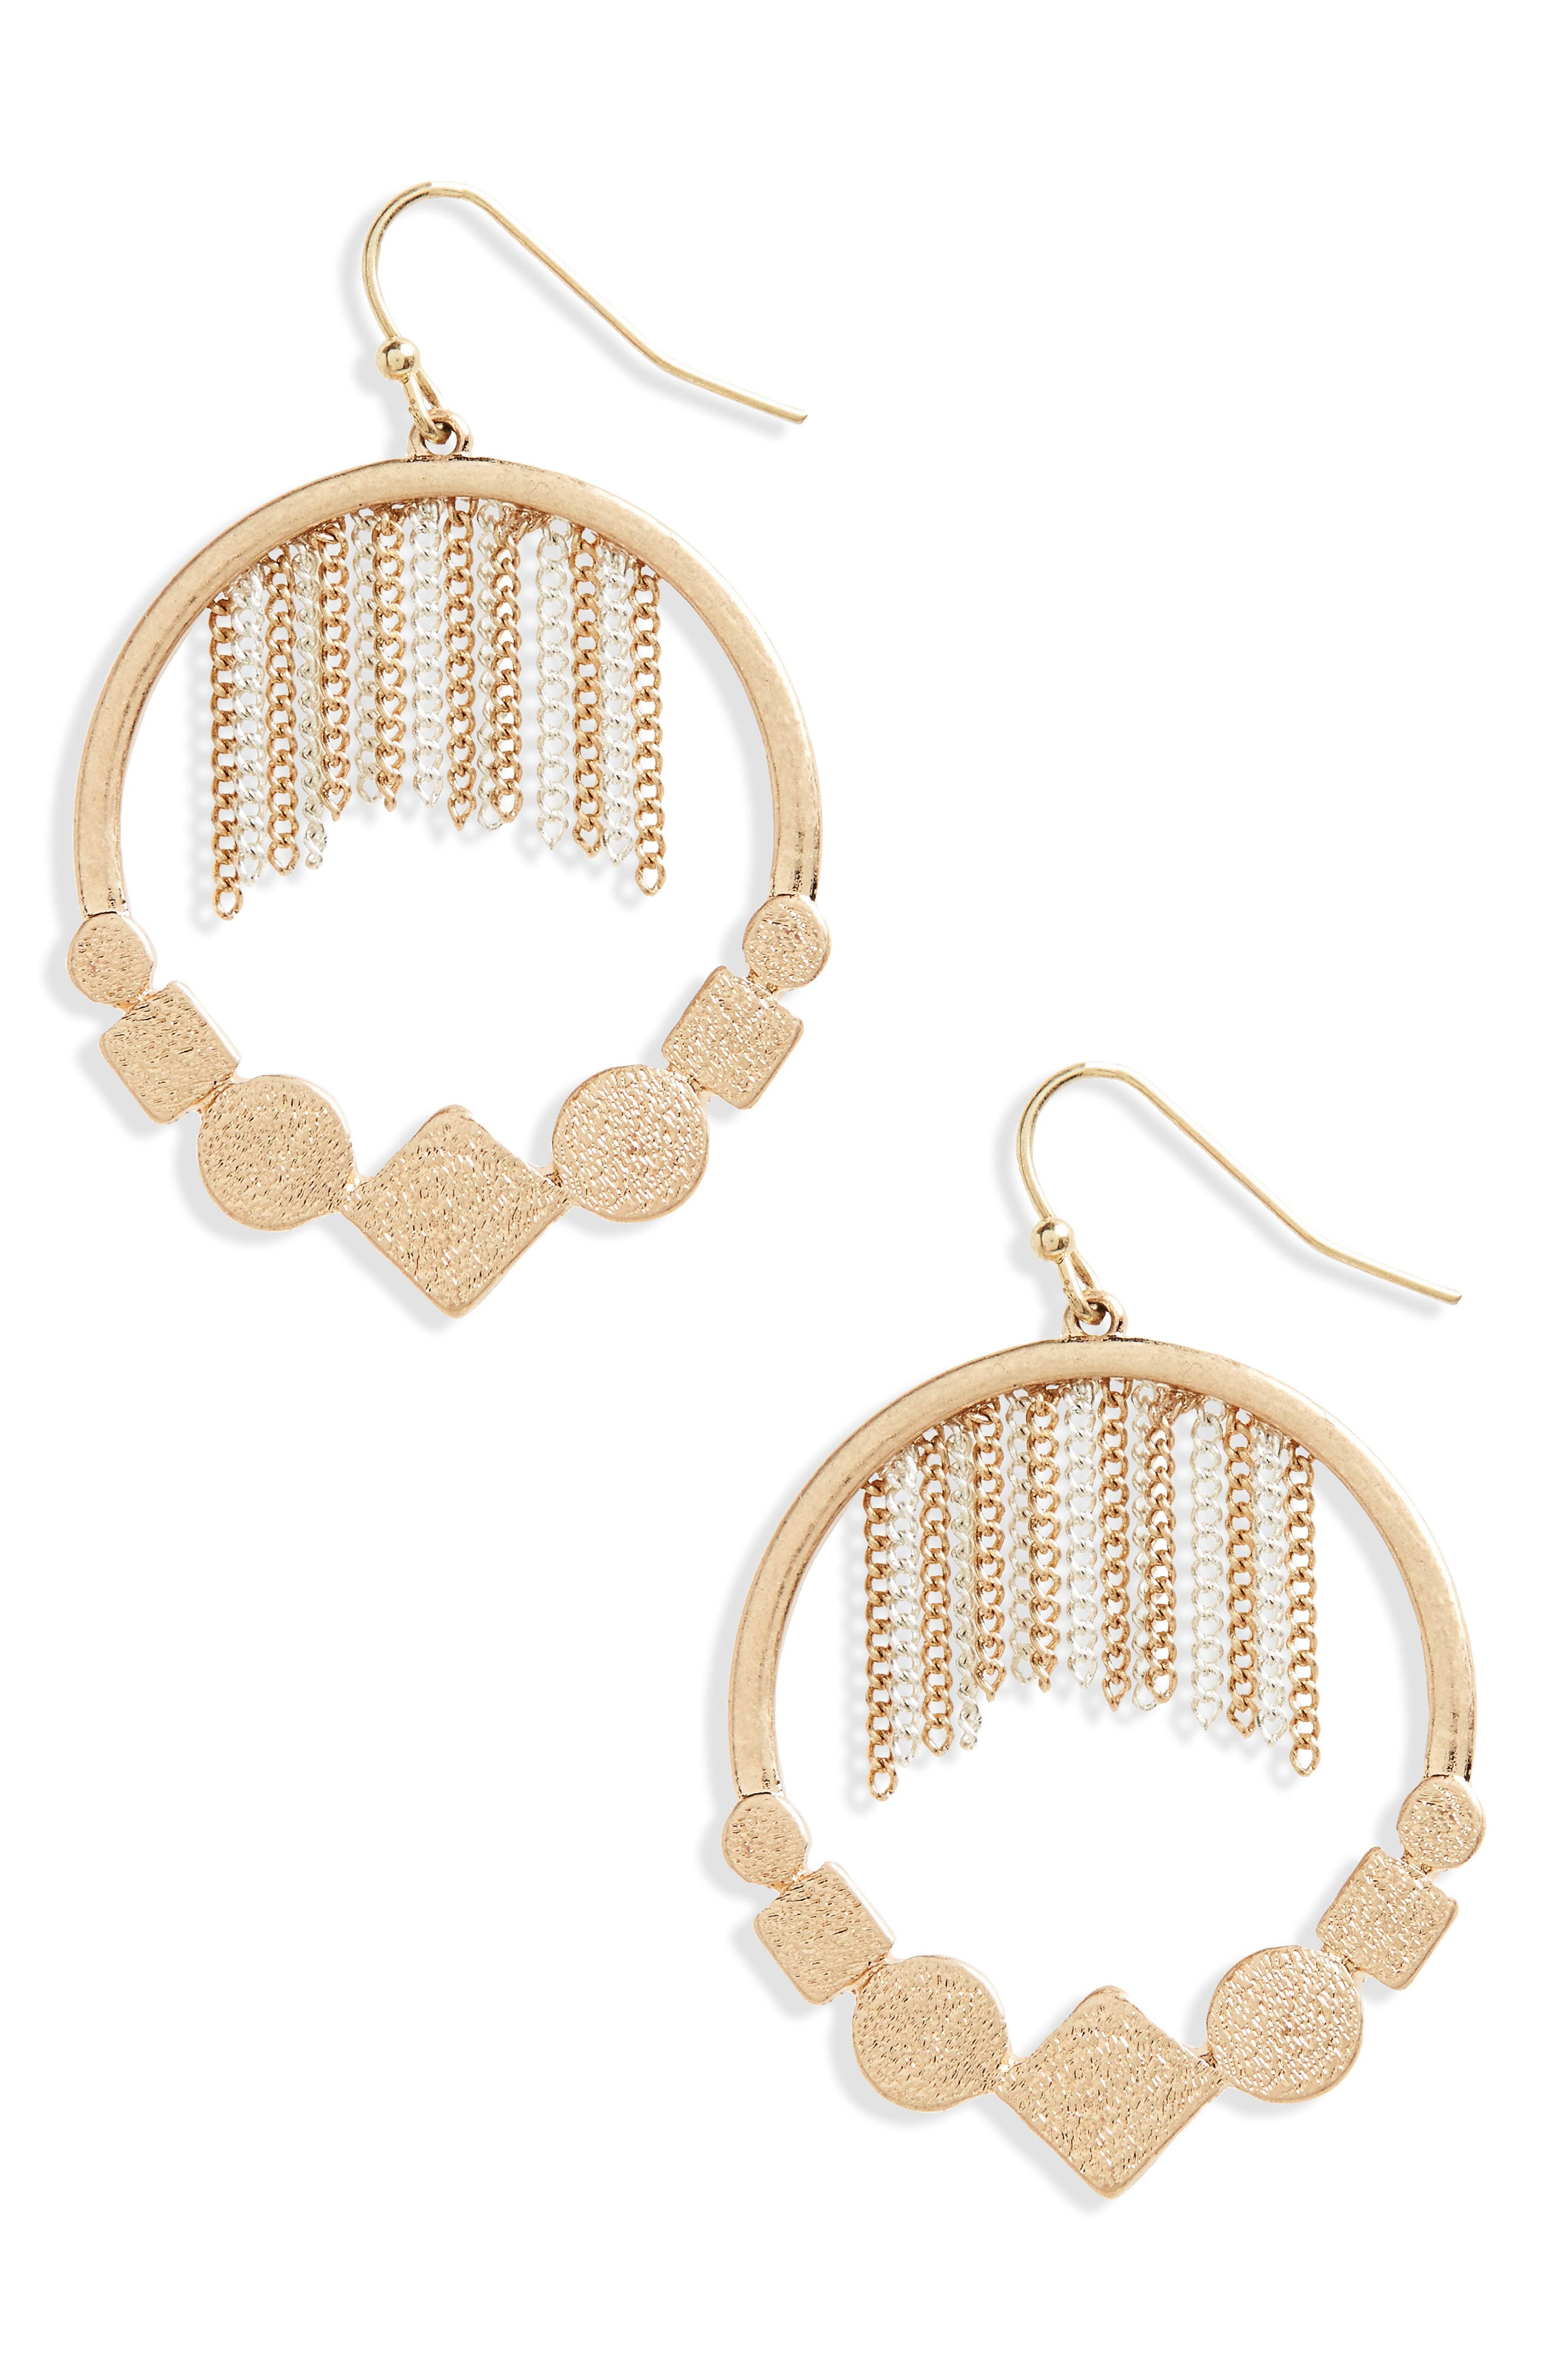 Main Image - Canvas Jewelry Chain Tassel Hoop Earrings